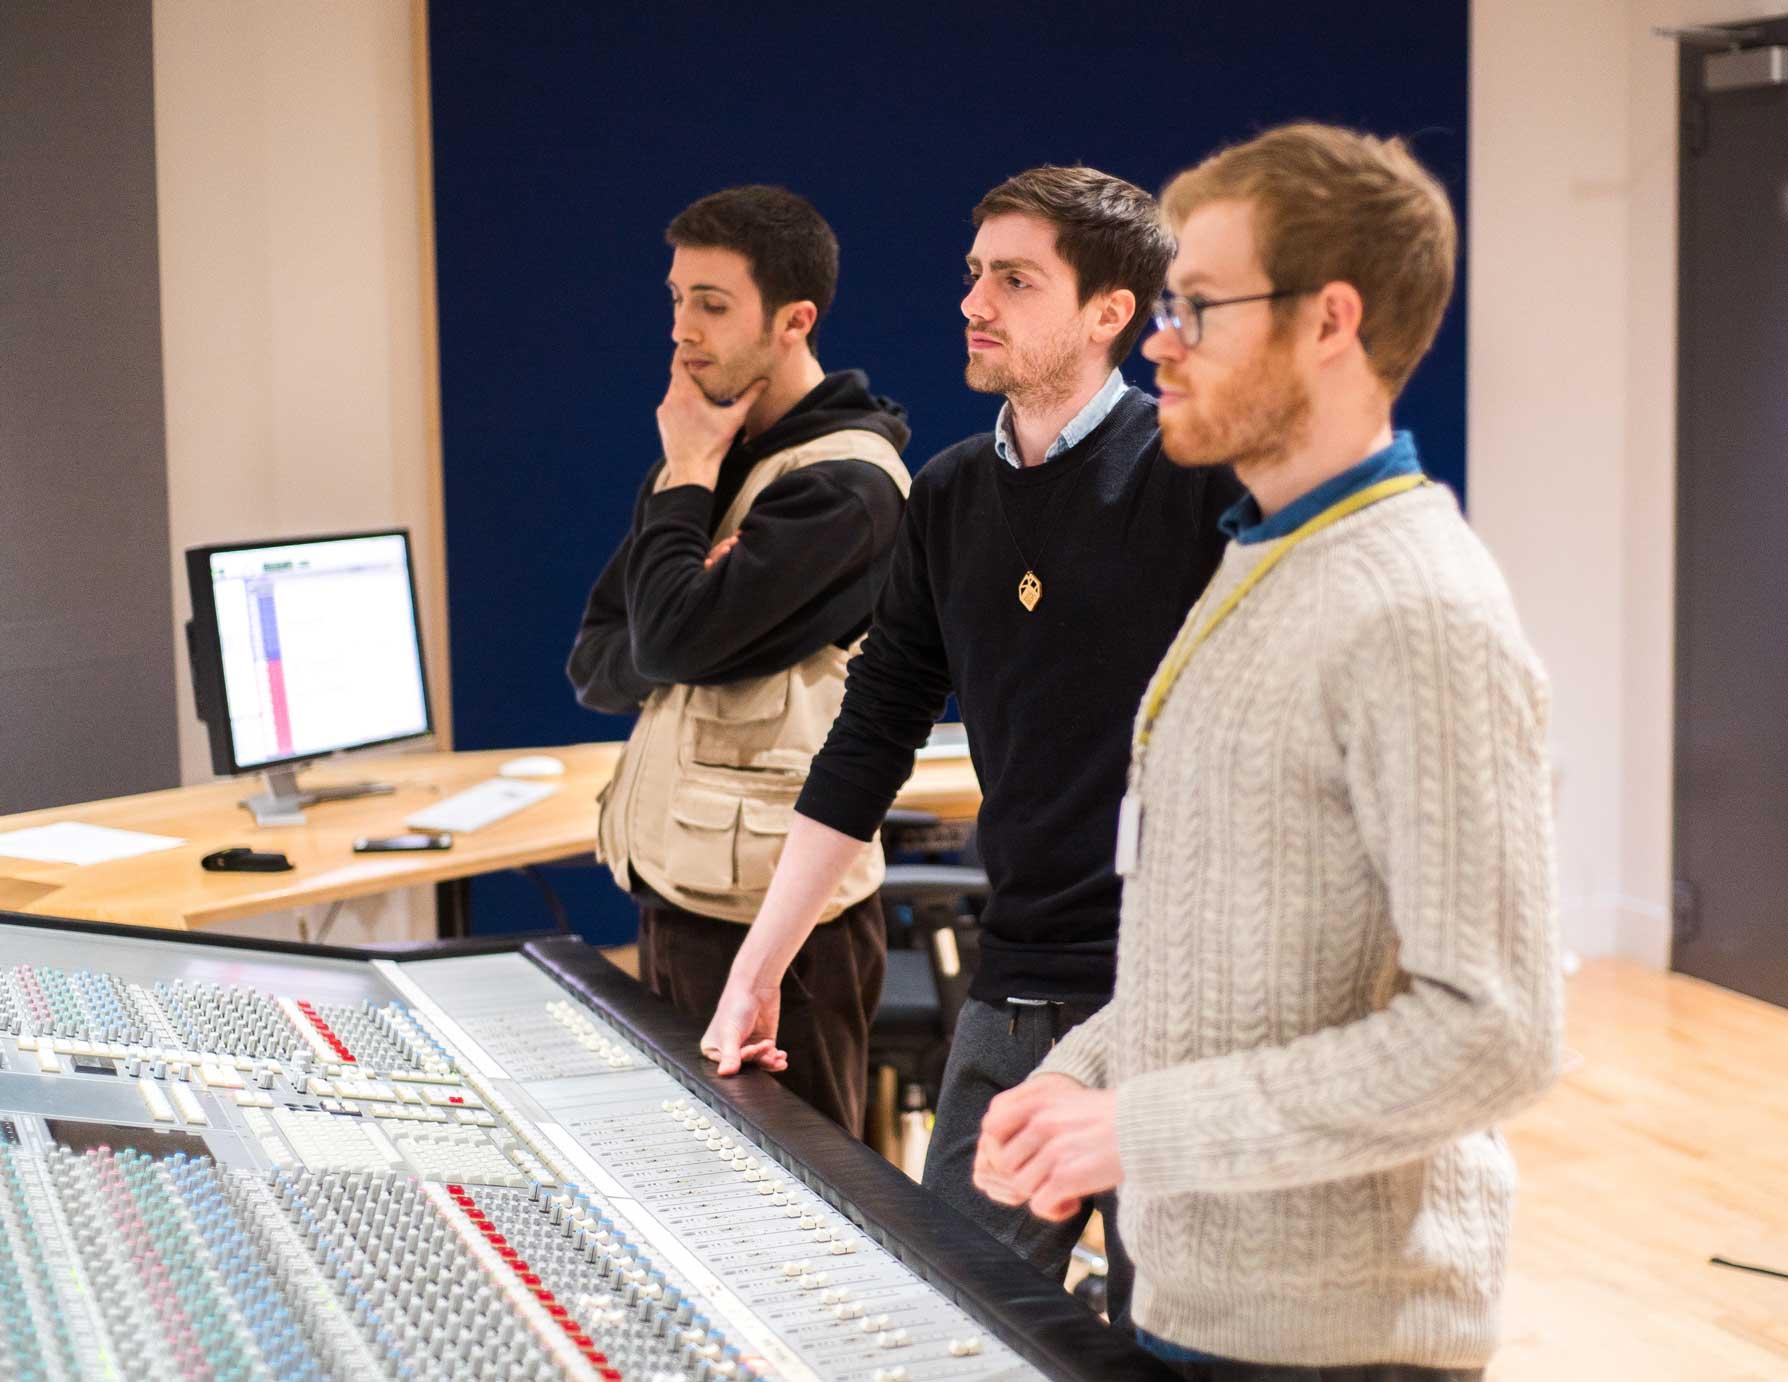 Original Soundtrack Recordings, from left to right: Nicolò Panzarasa (Recording Engineer), Ioan Holland (Director & Writer), Aaron Buckley (Soundtrack Composer)